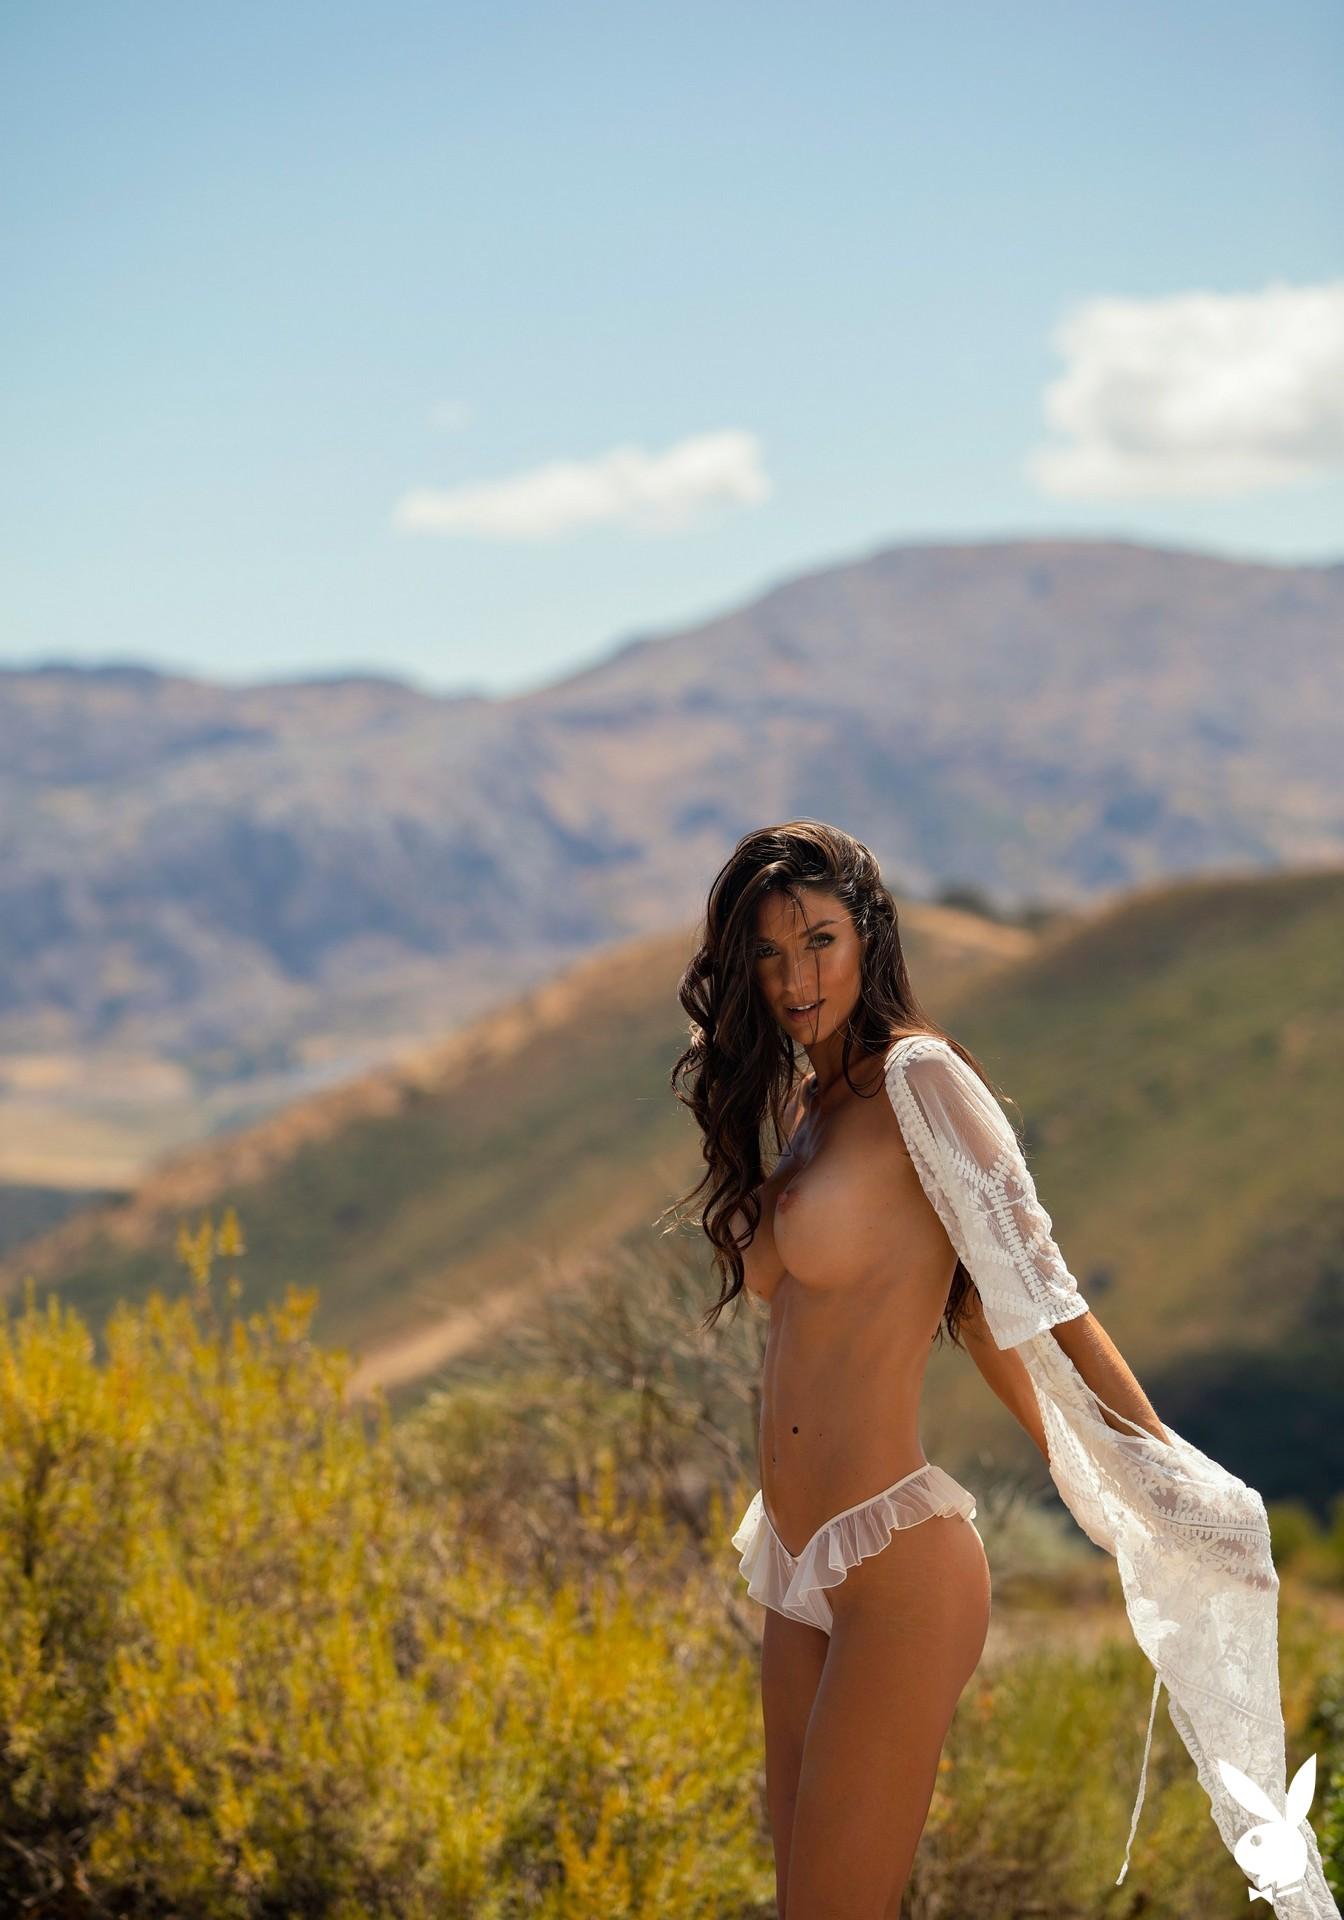 Zurine Aspiunza In Playboy International Playboy Plus (13)